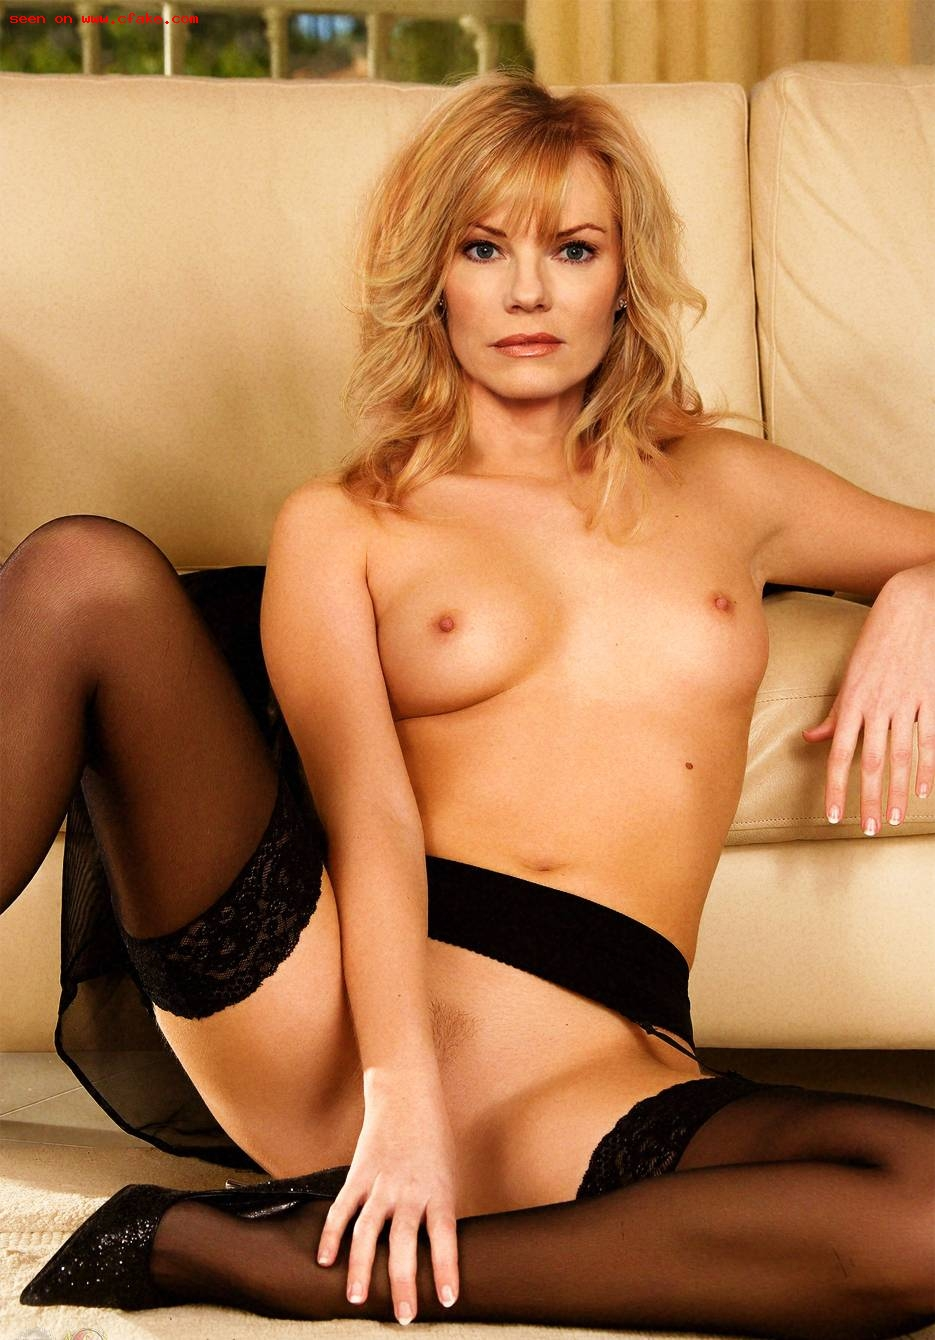 Sexual marg helgenberger nude body scene celebrity, scronsnoop